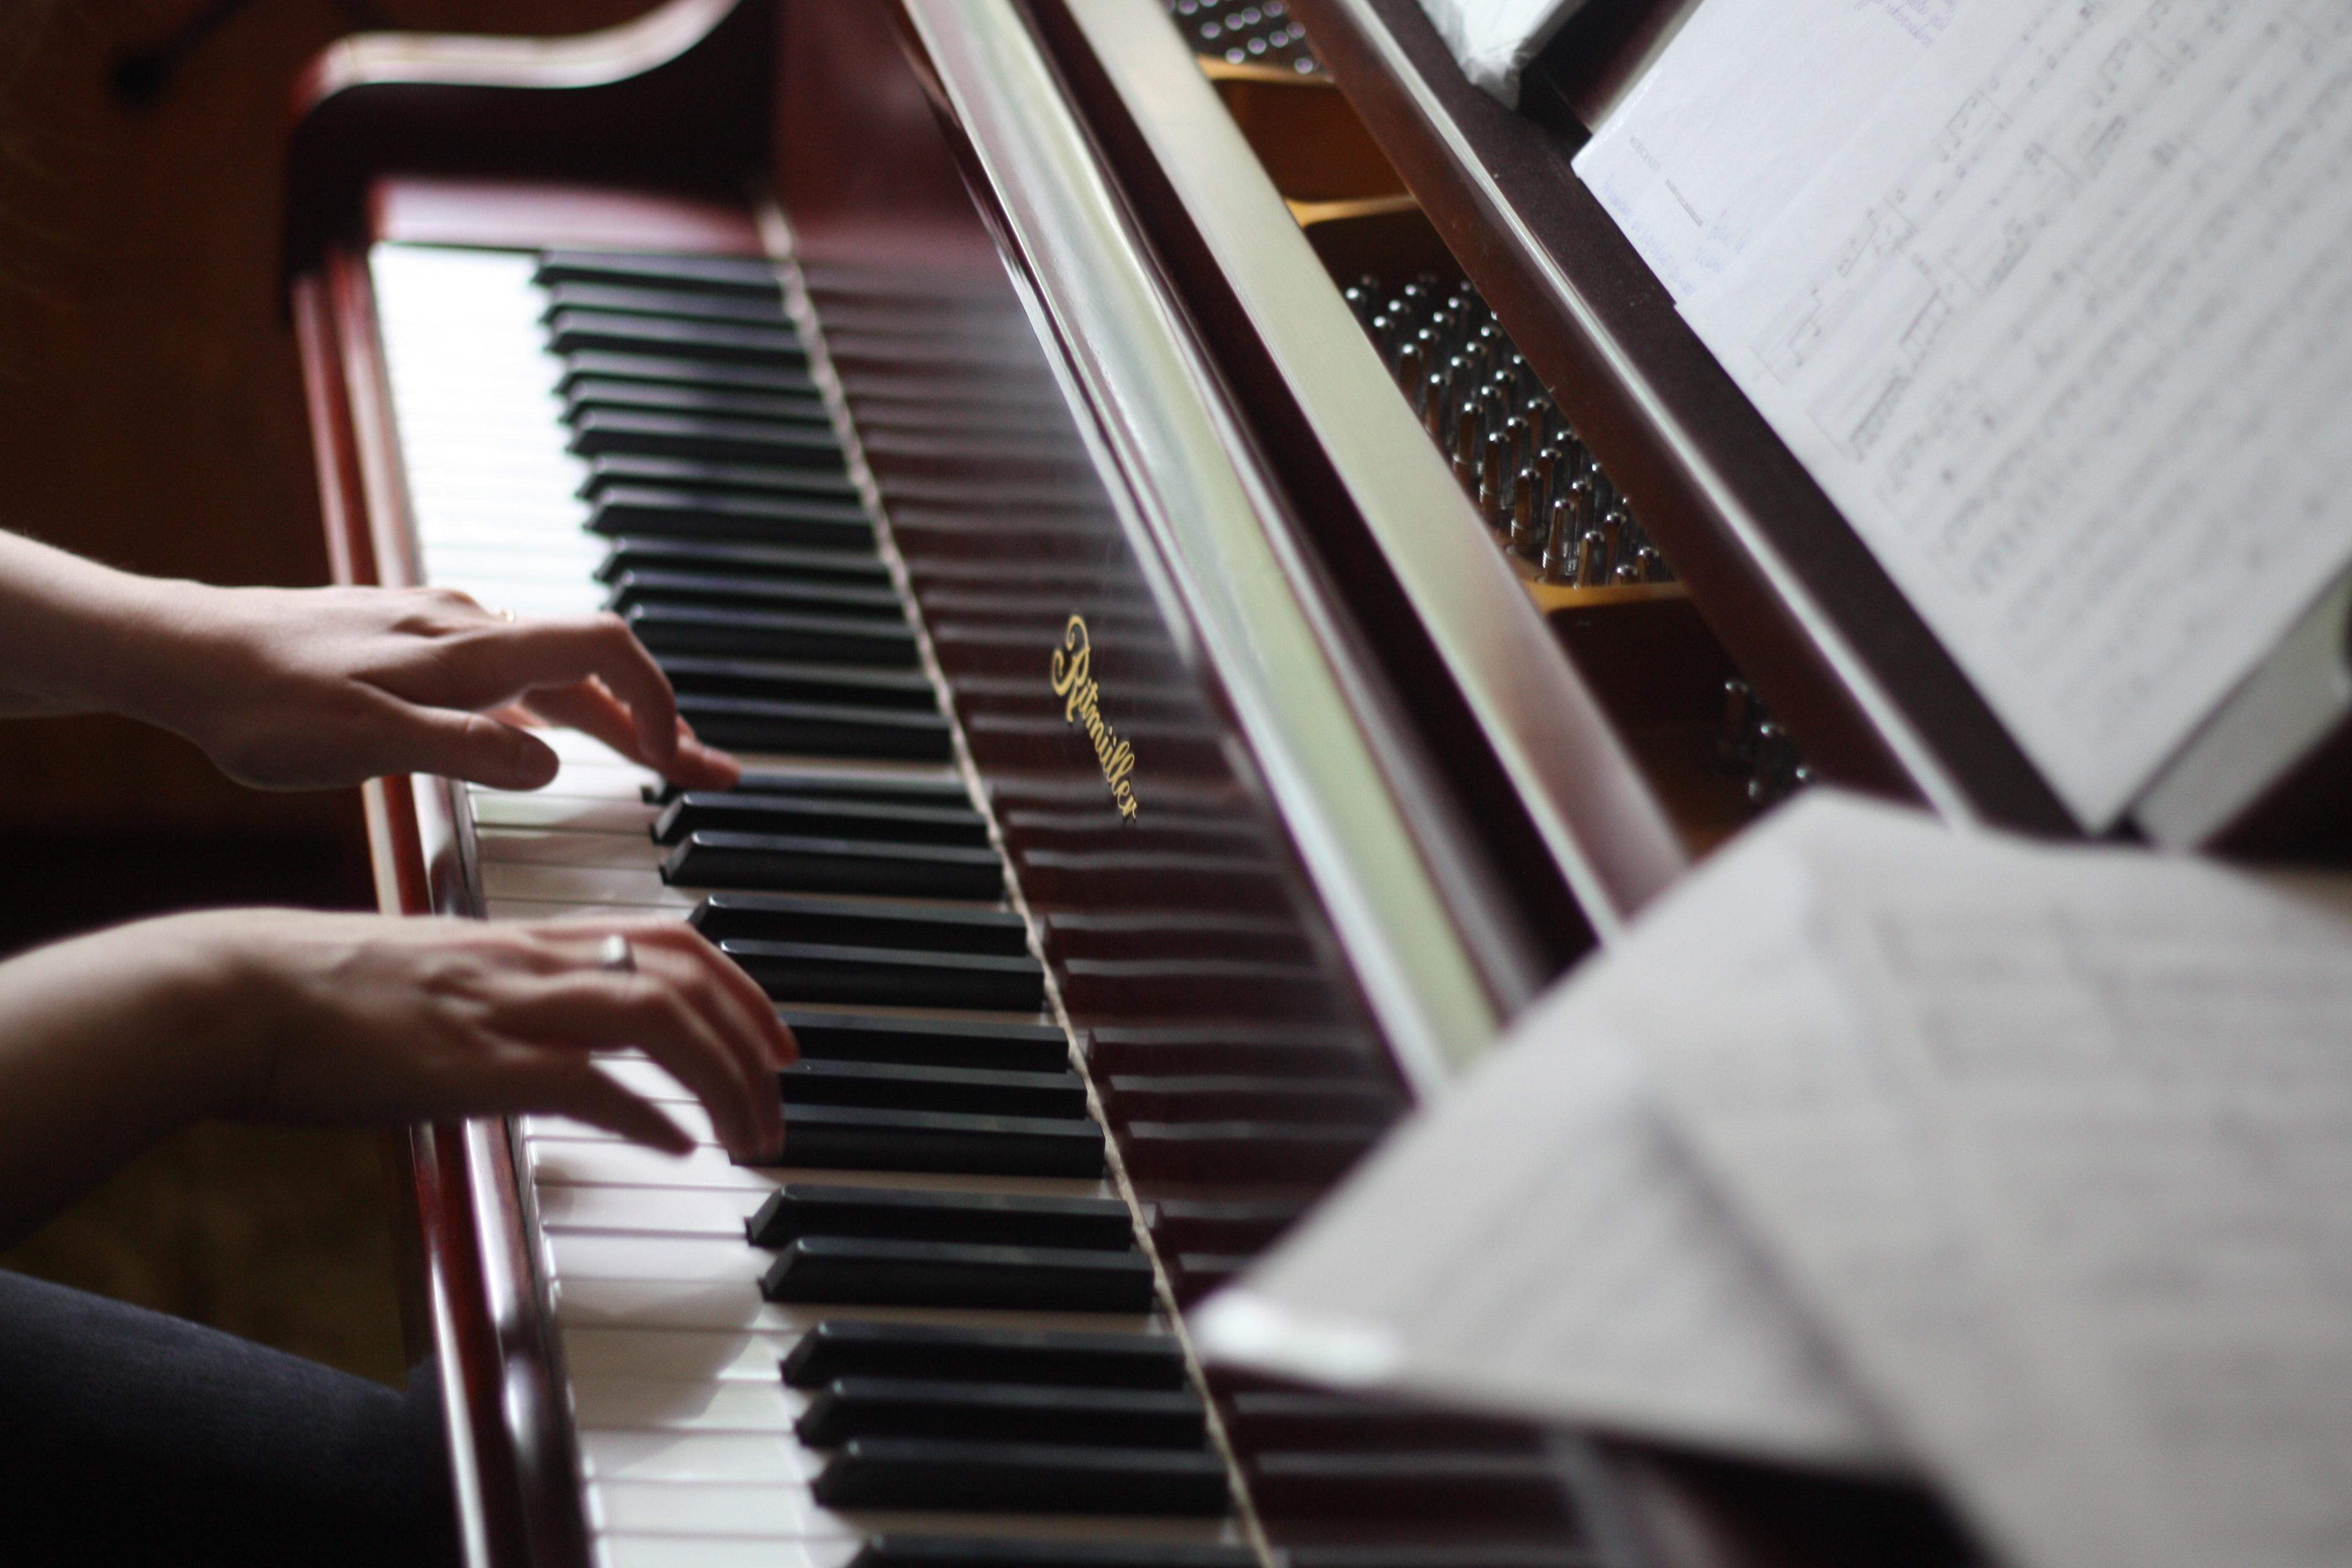 The everyday extraordinariness of musicians